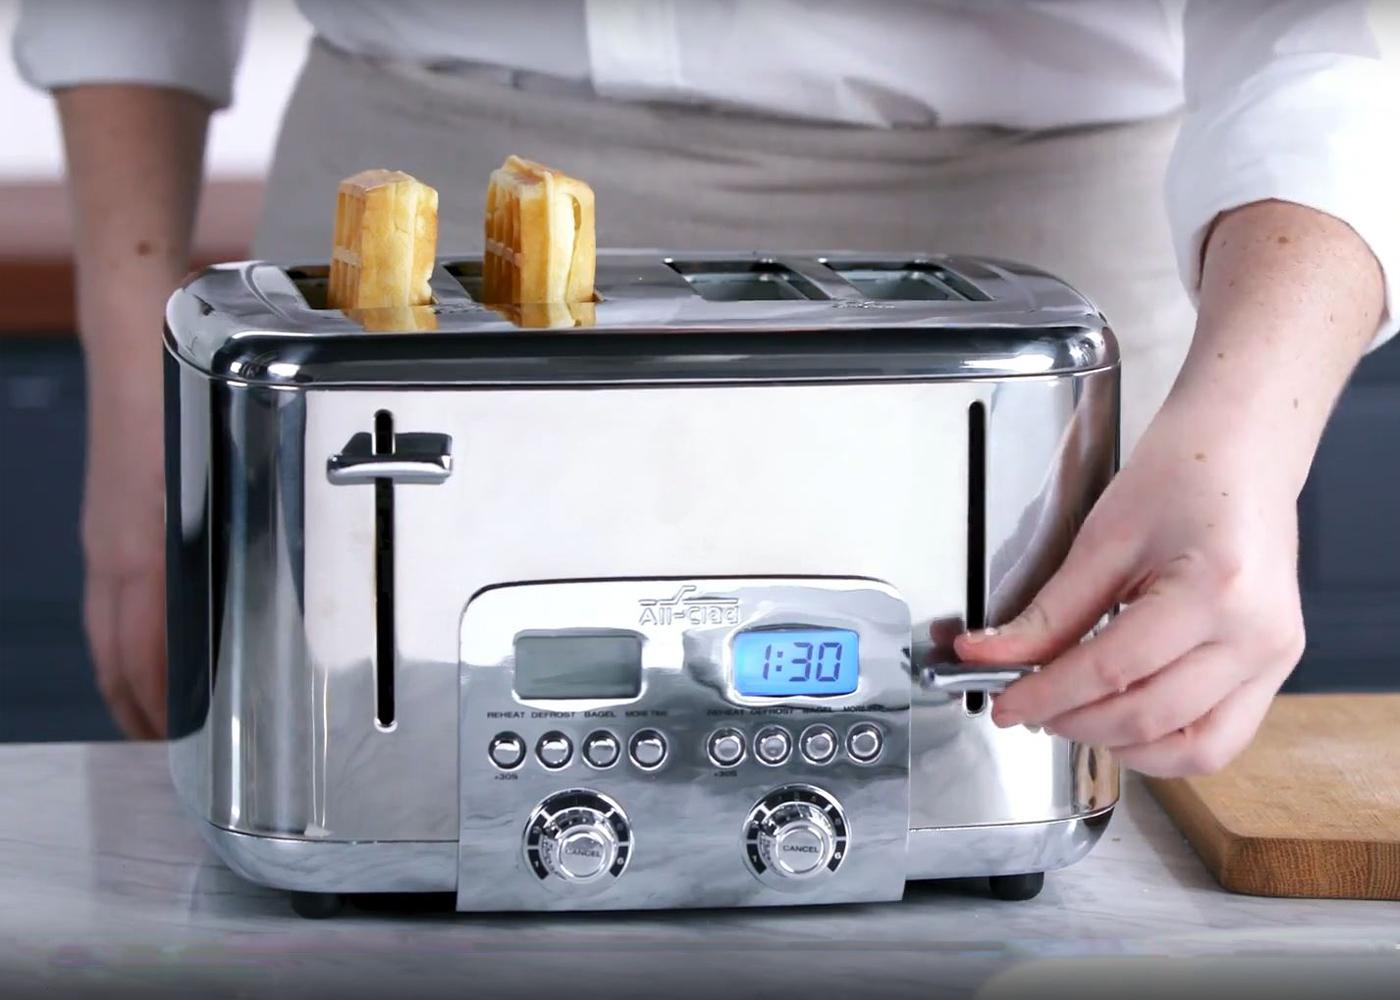 ALL-Clad_Electrics_Toaster_0008_Scene_03.jpg